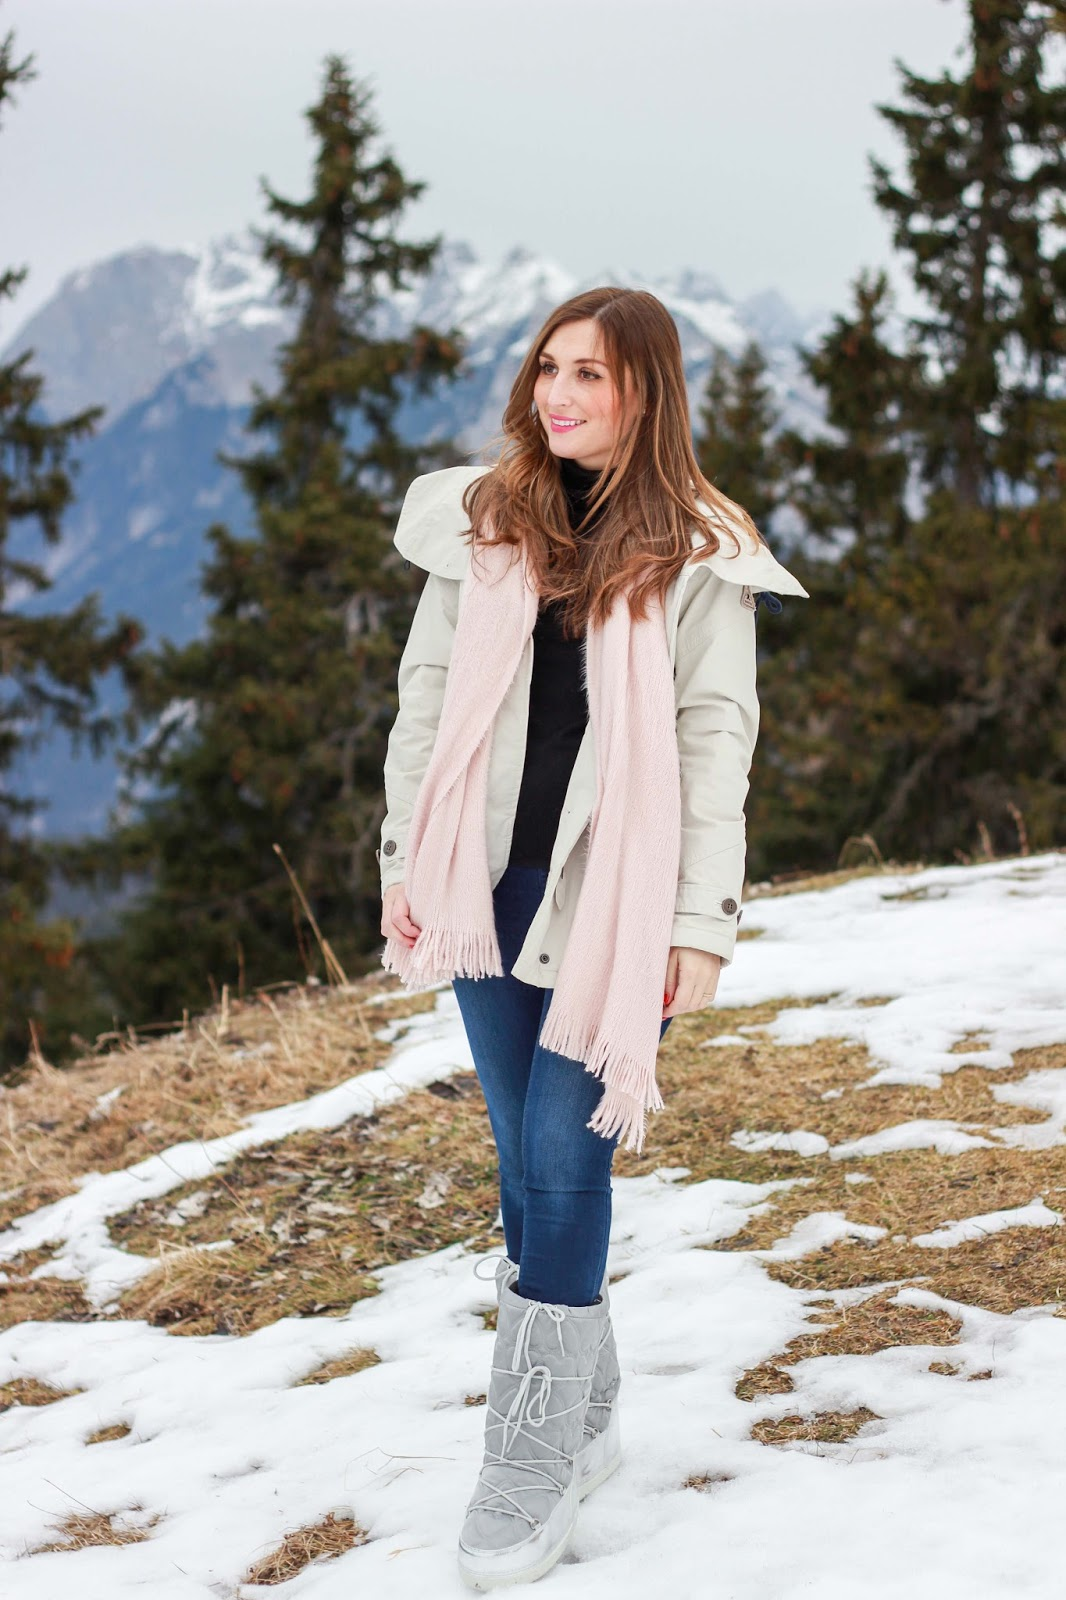 Moon Boots Fashionstylebyjohanna Fashionblog